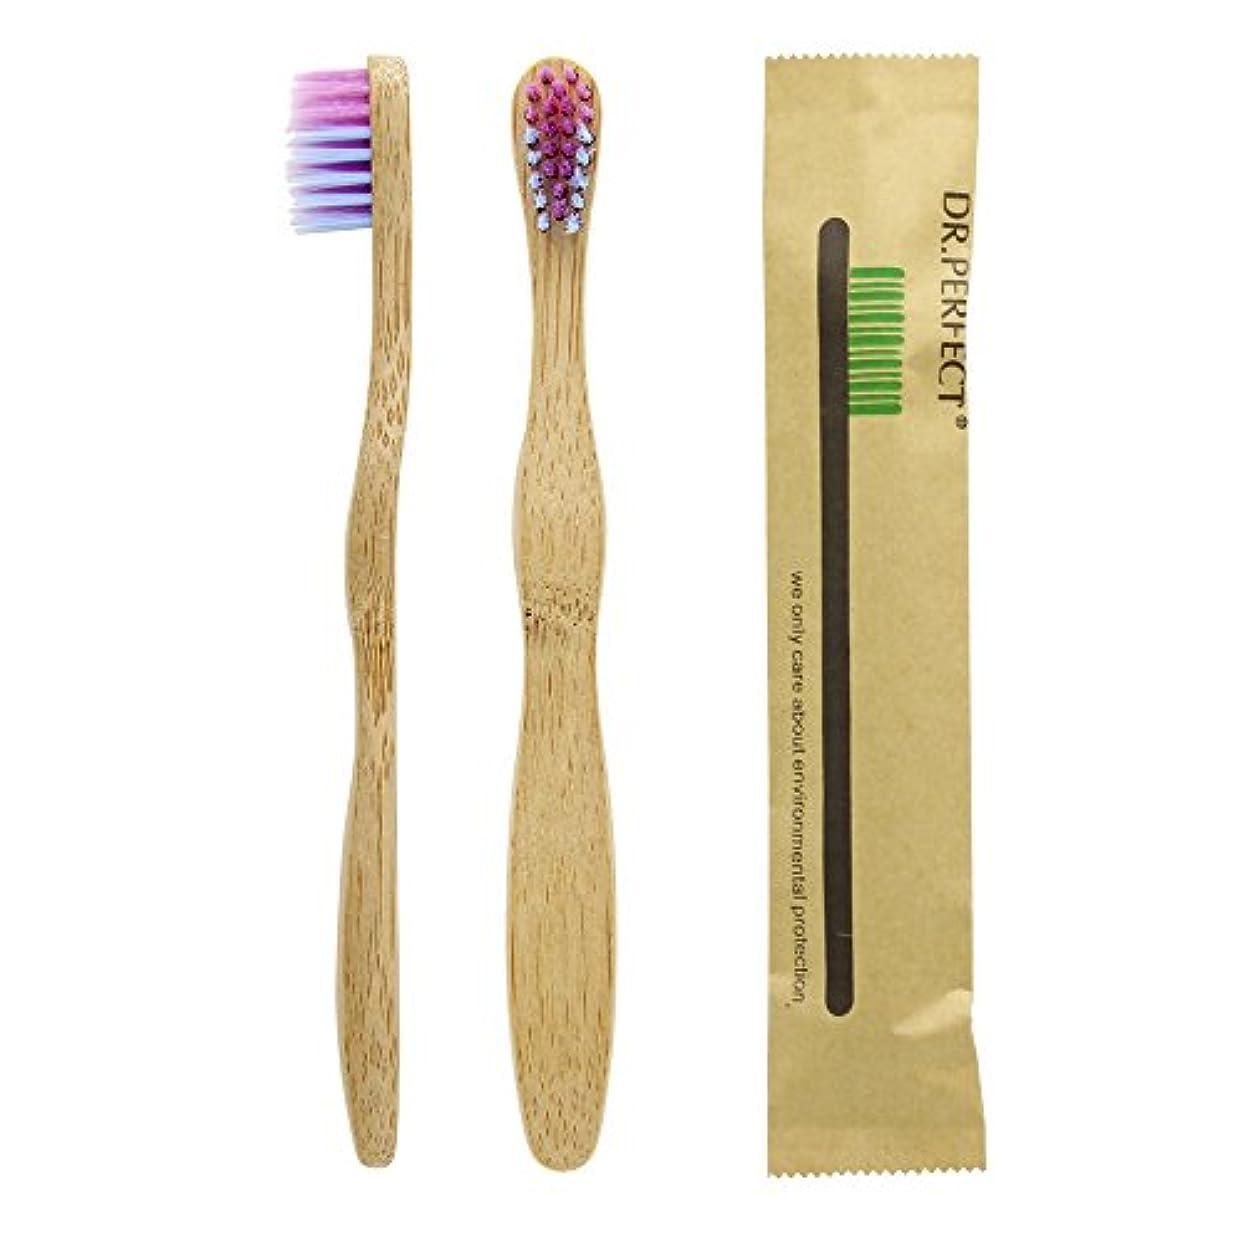 Dr.Perfect Bamboo チャイルド 竹の歯ブラシ ナイロン毛 生分解性の (パープル)